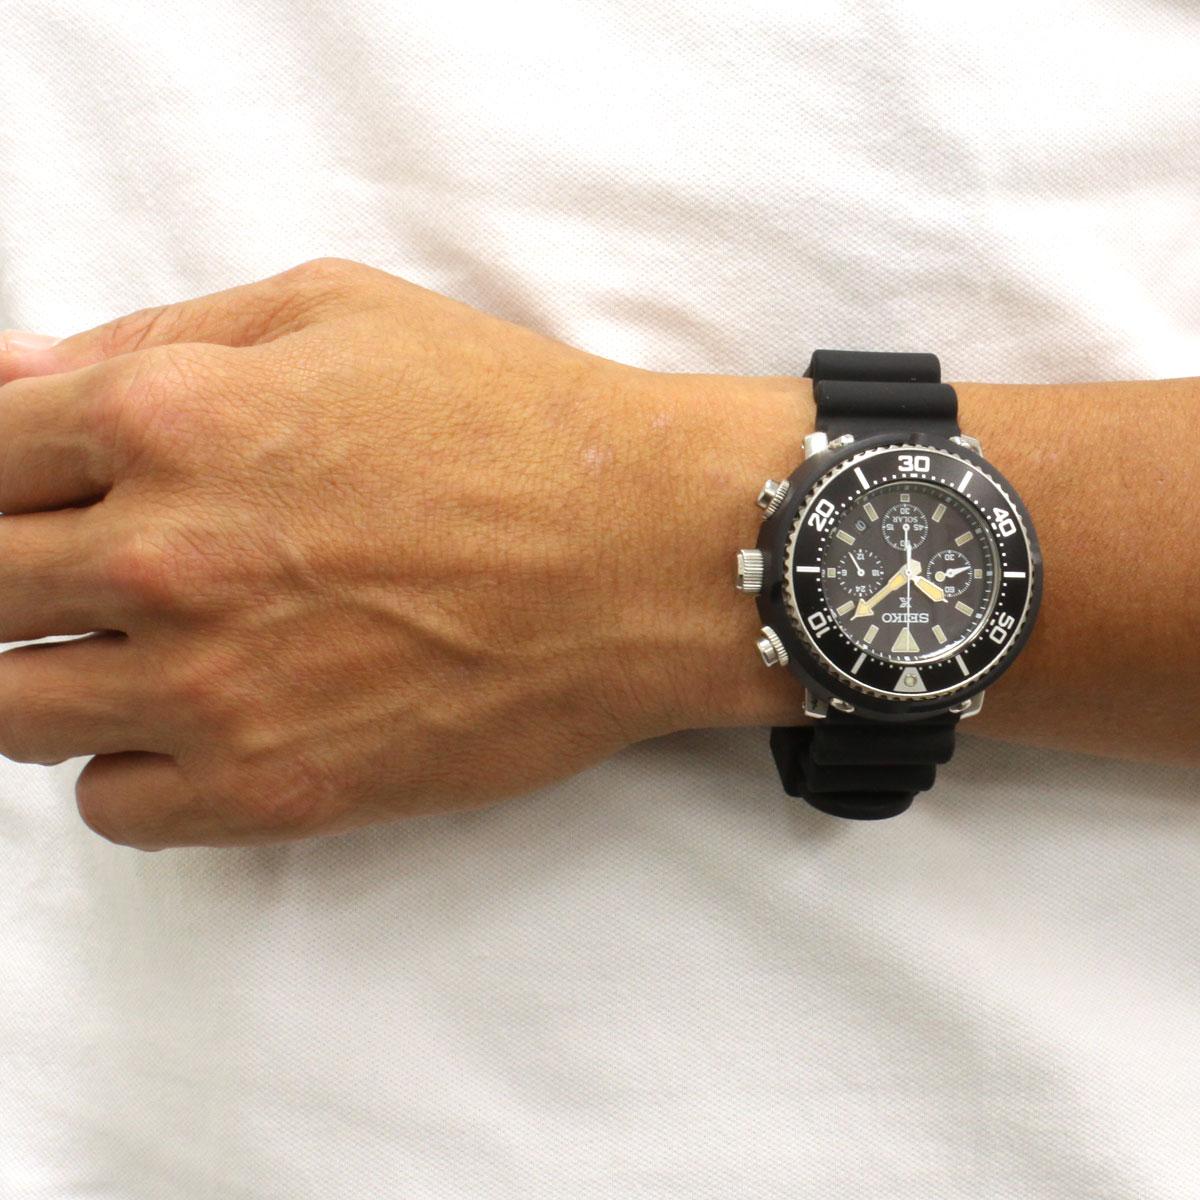 super popular 0f0a2 d8691 SEIKO Pross pecks SEIKO PROSPEX diver scuba LOWERCASE shop-limited model  solar chronograph watch SBDL041